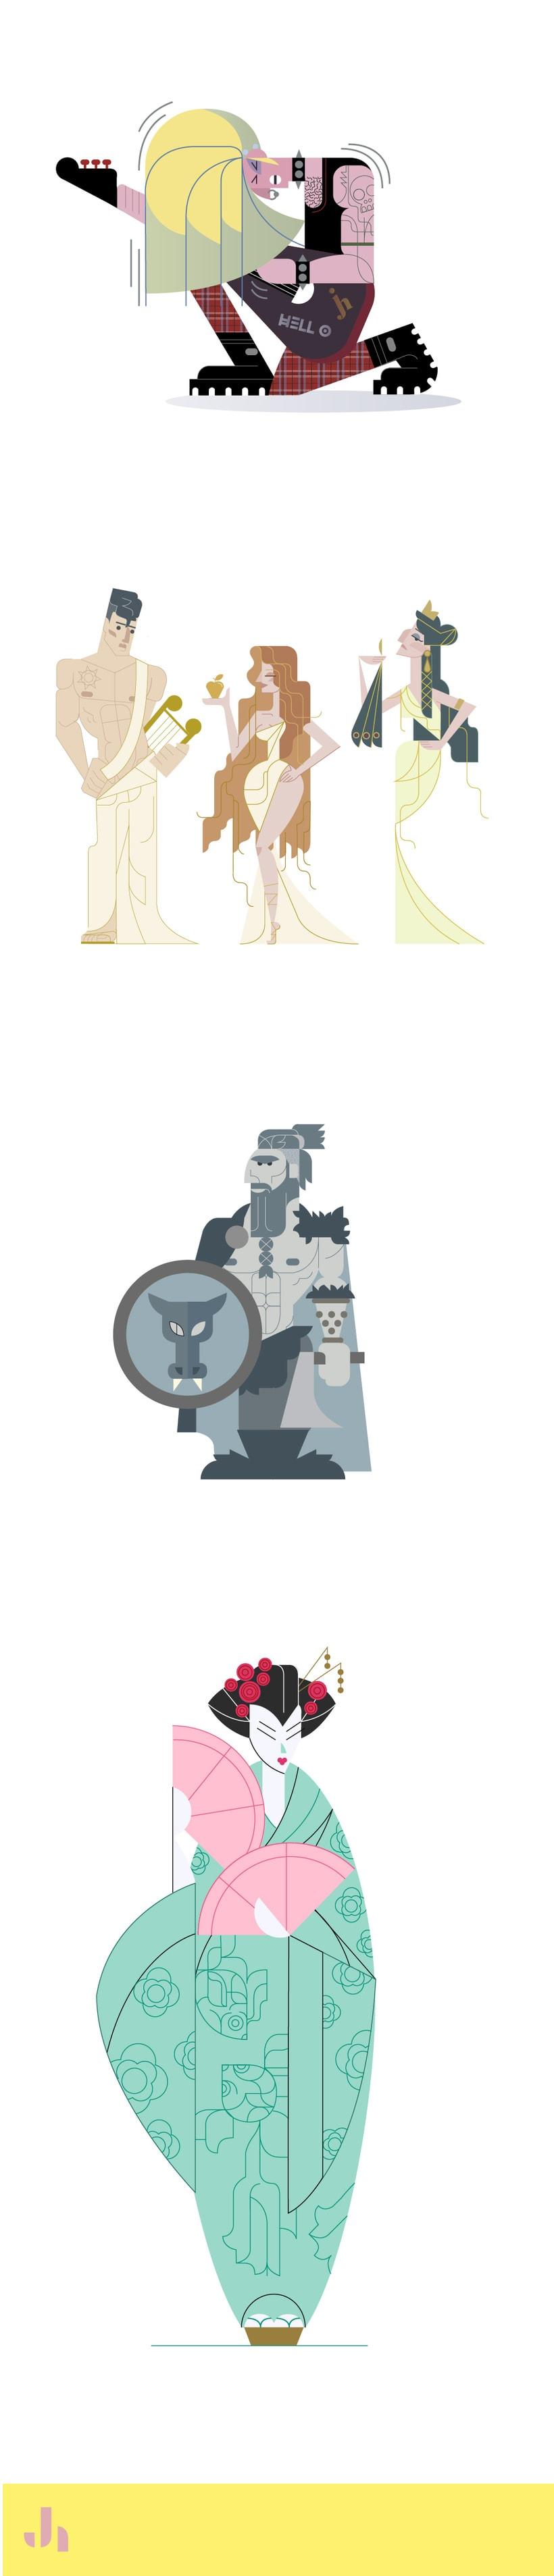 Diseño de personajes para el character design challenge 3